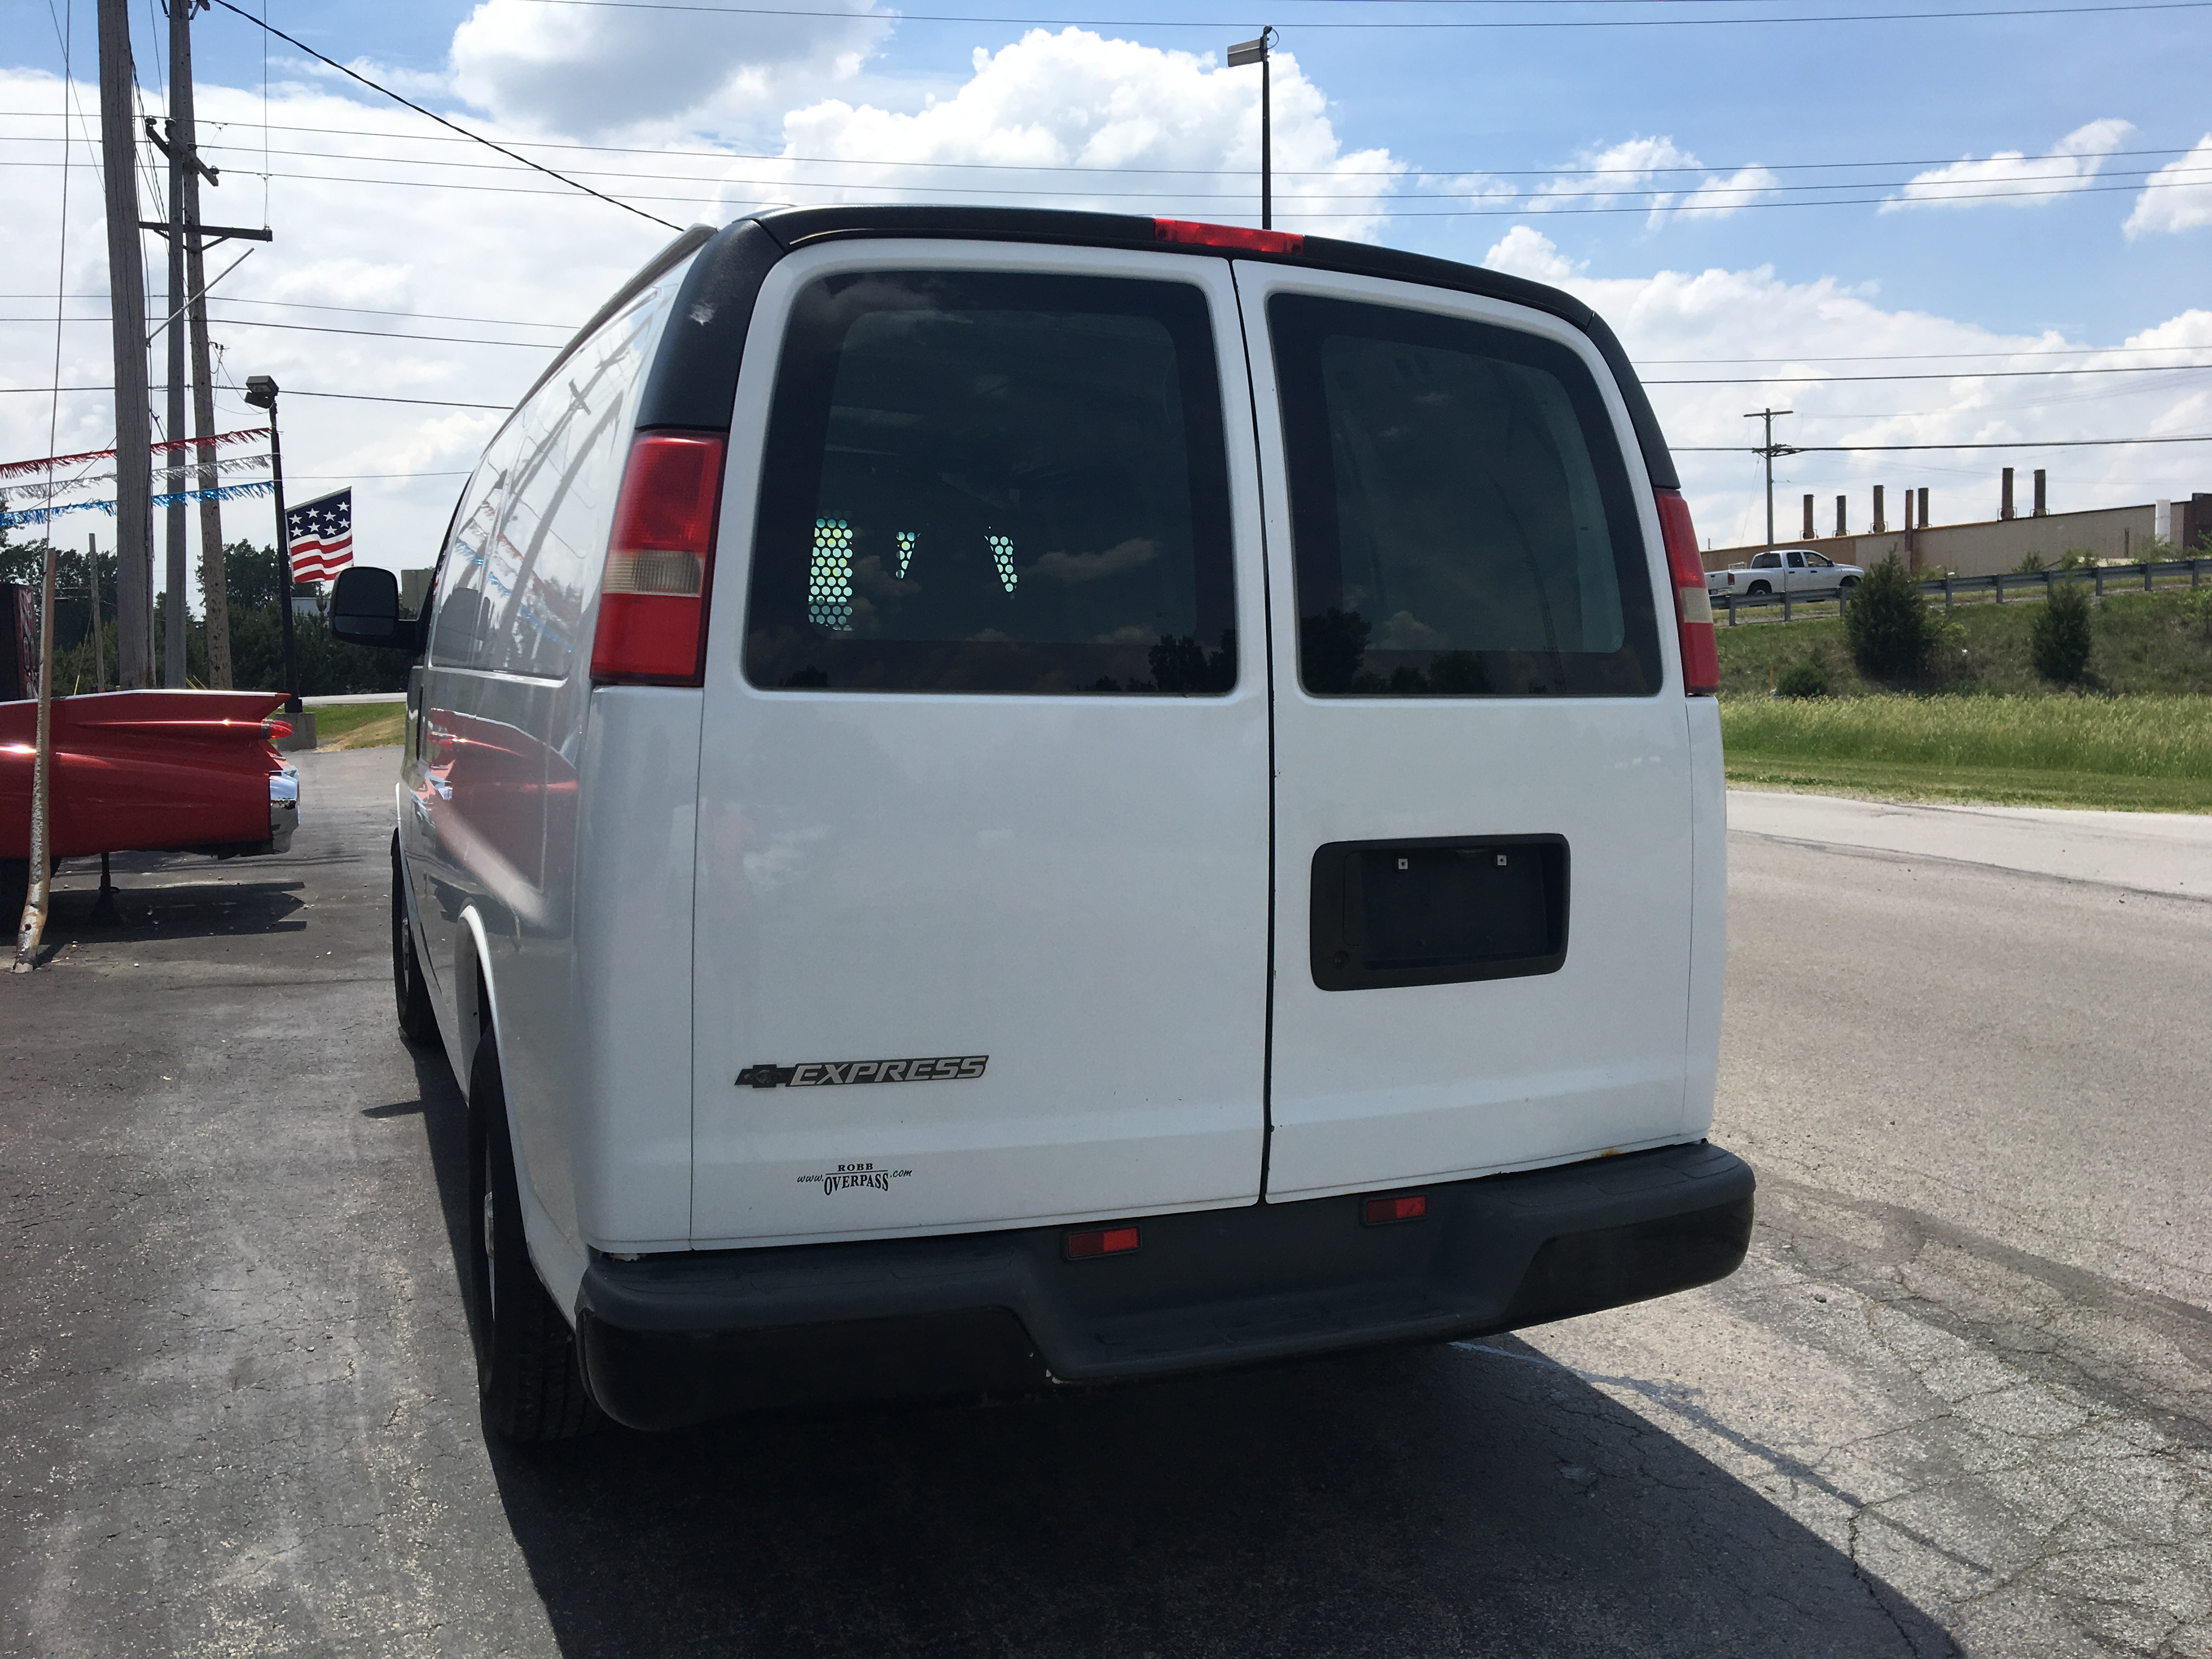 2008 Chevrolet Express 1500 Cargo Vn